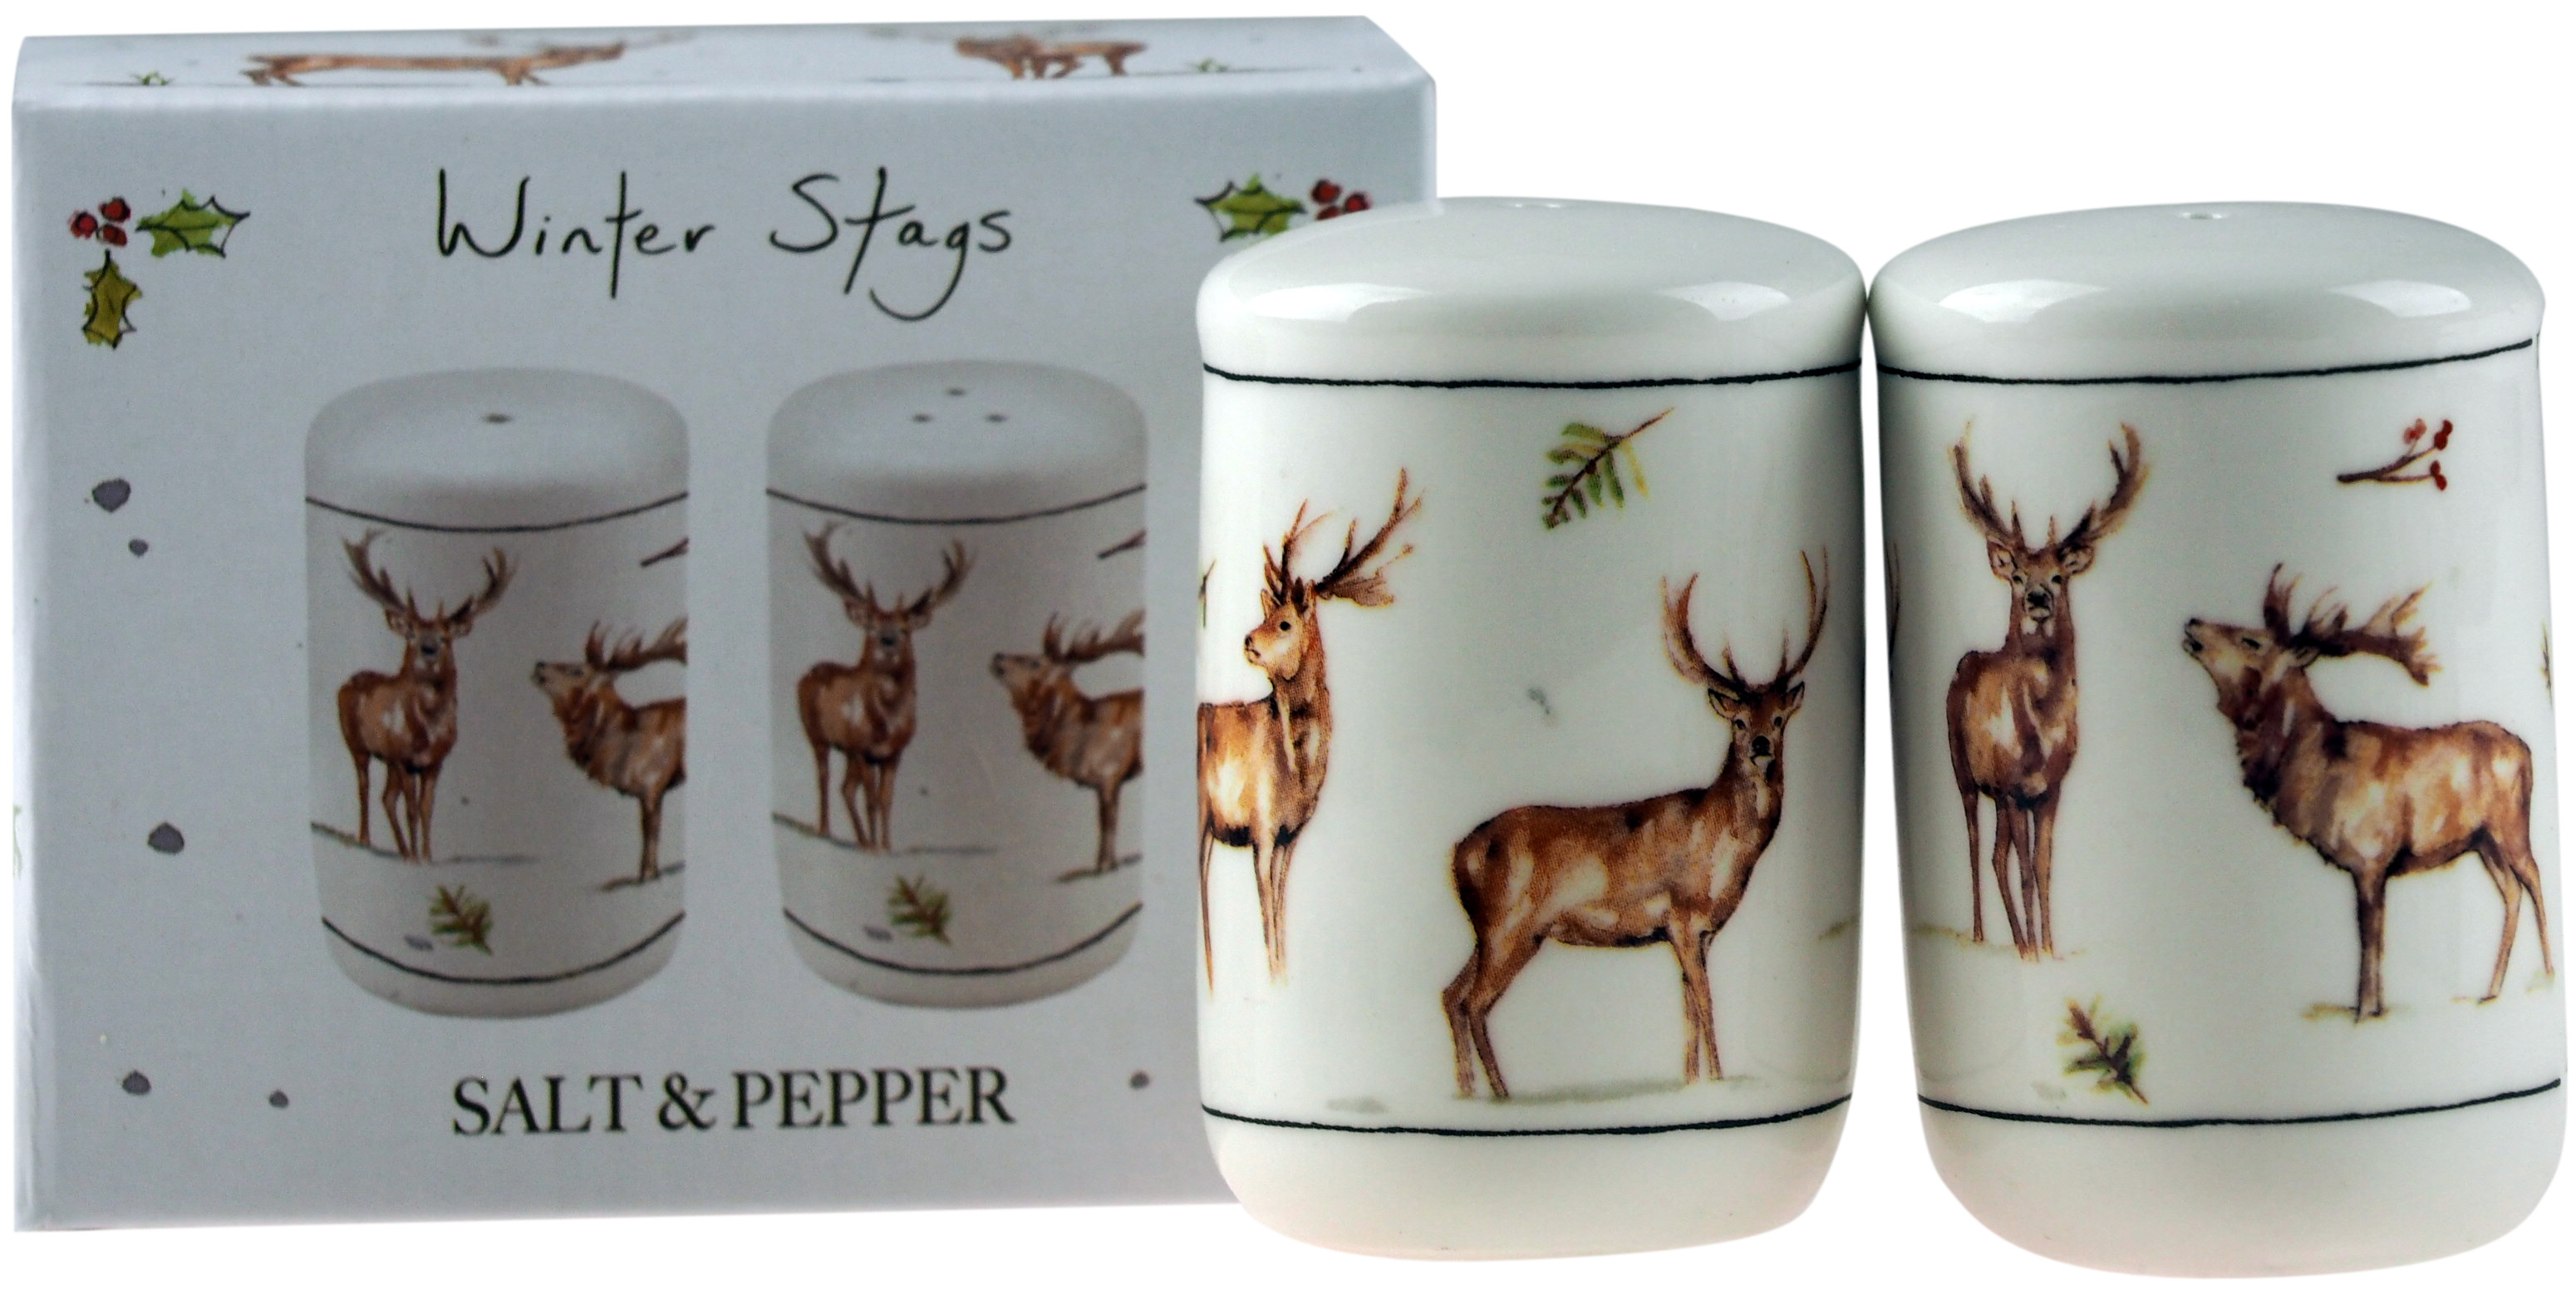 Festive Winter Stags Salt /& Pepper Cruet Set Kitchen Accessory Brand New and Box